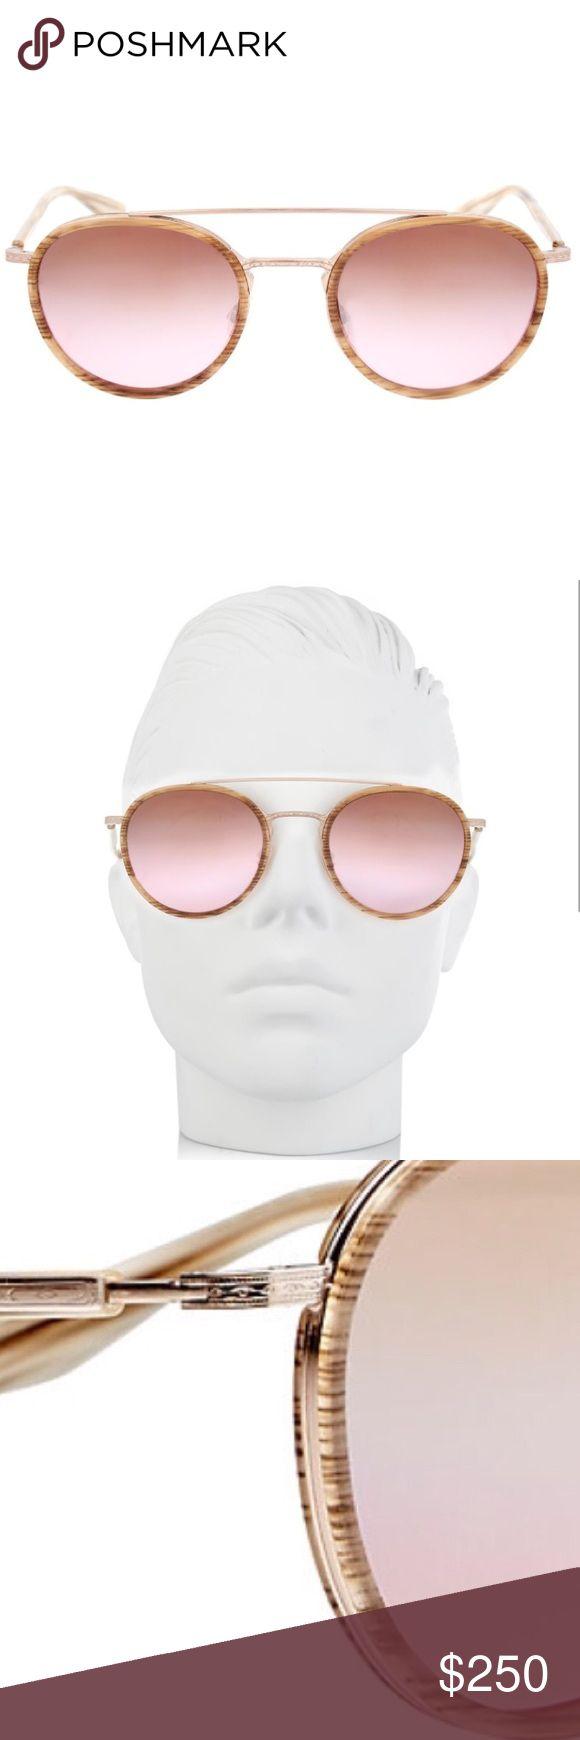 Barton Perreira Justice Rose Gold Sunglasses! Round Barton Perreira Justice Sunglasses! Rose gold coloring. Gradient style lens. Accessories Sunglasses